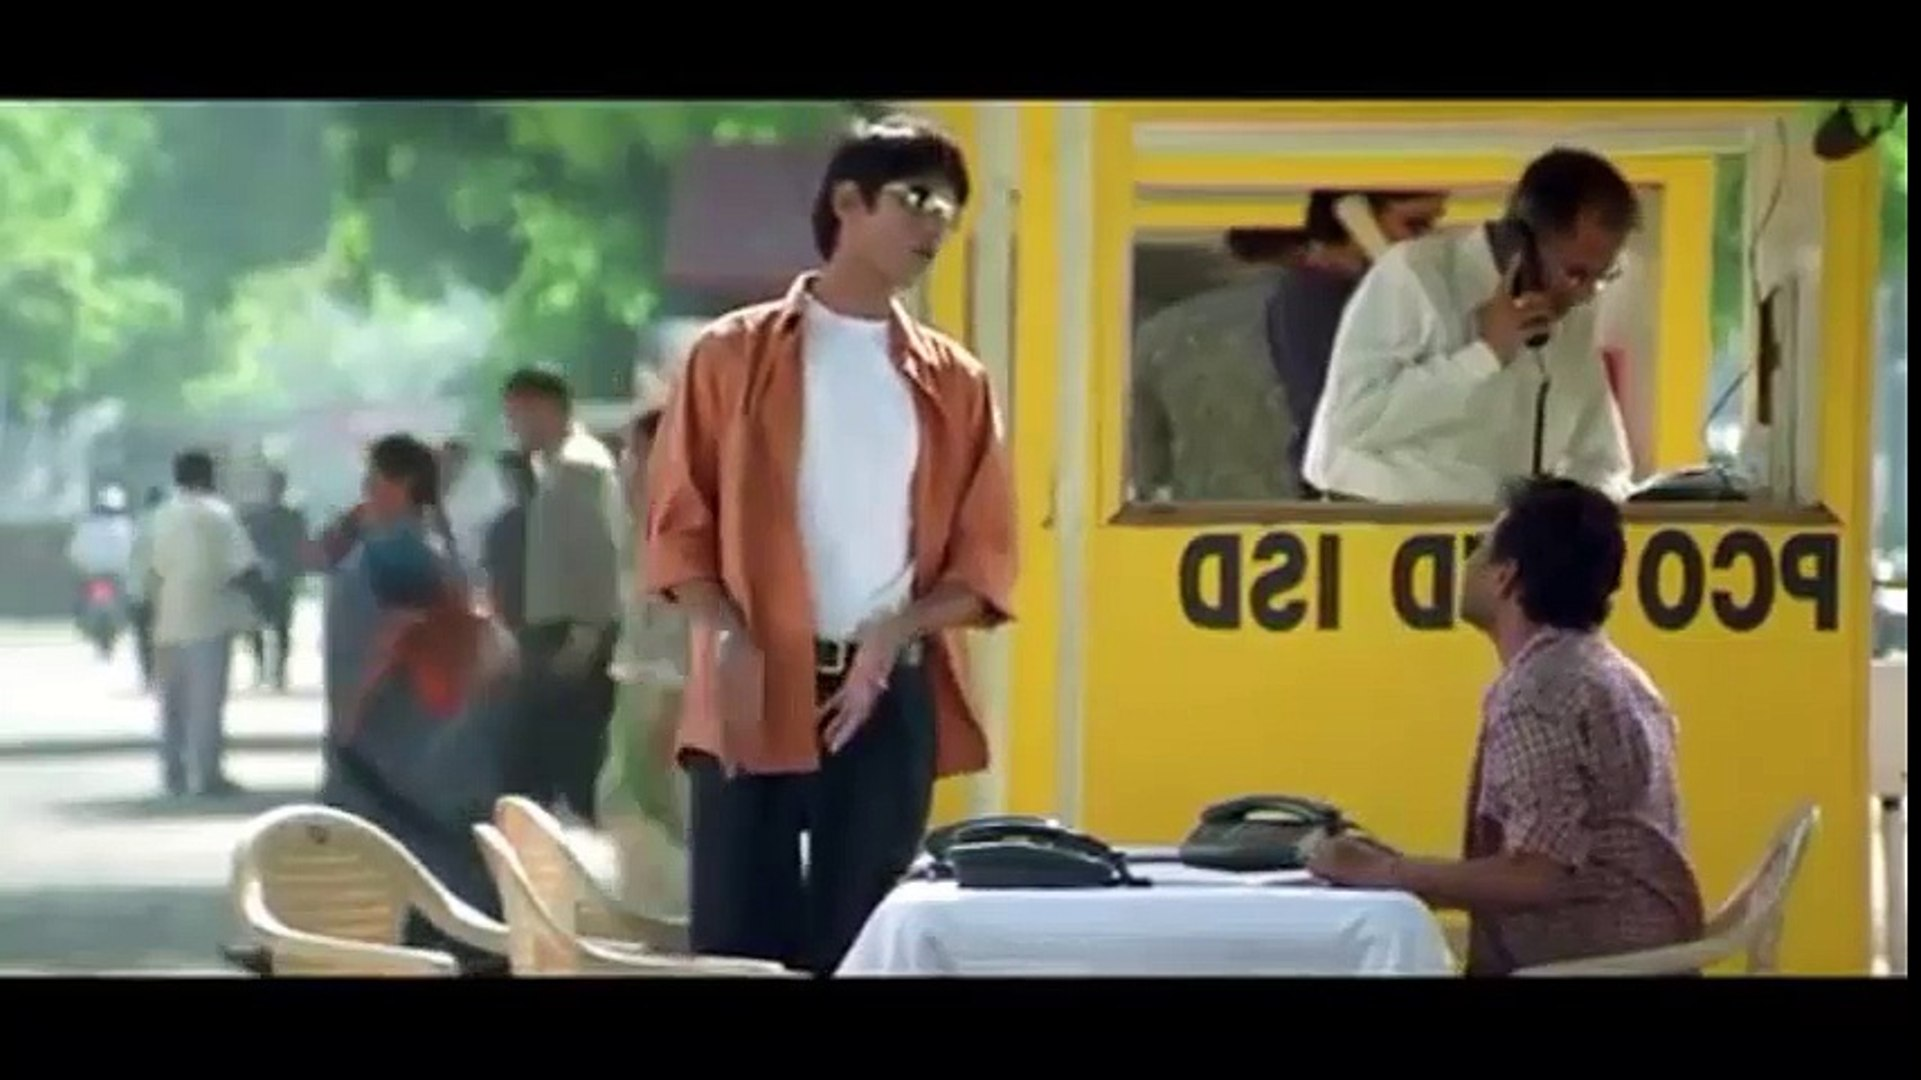 Hindi funny movies list|Top 10 Bollywood Comedy Movies|Comedy Movies Bollywood  2017